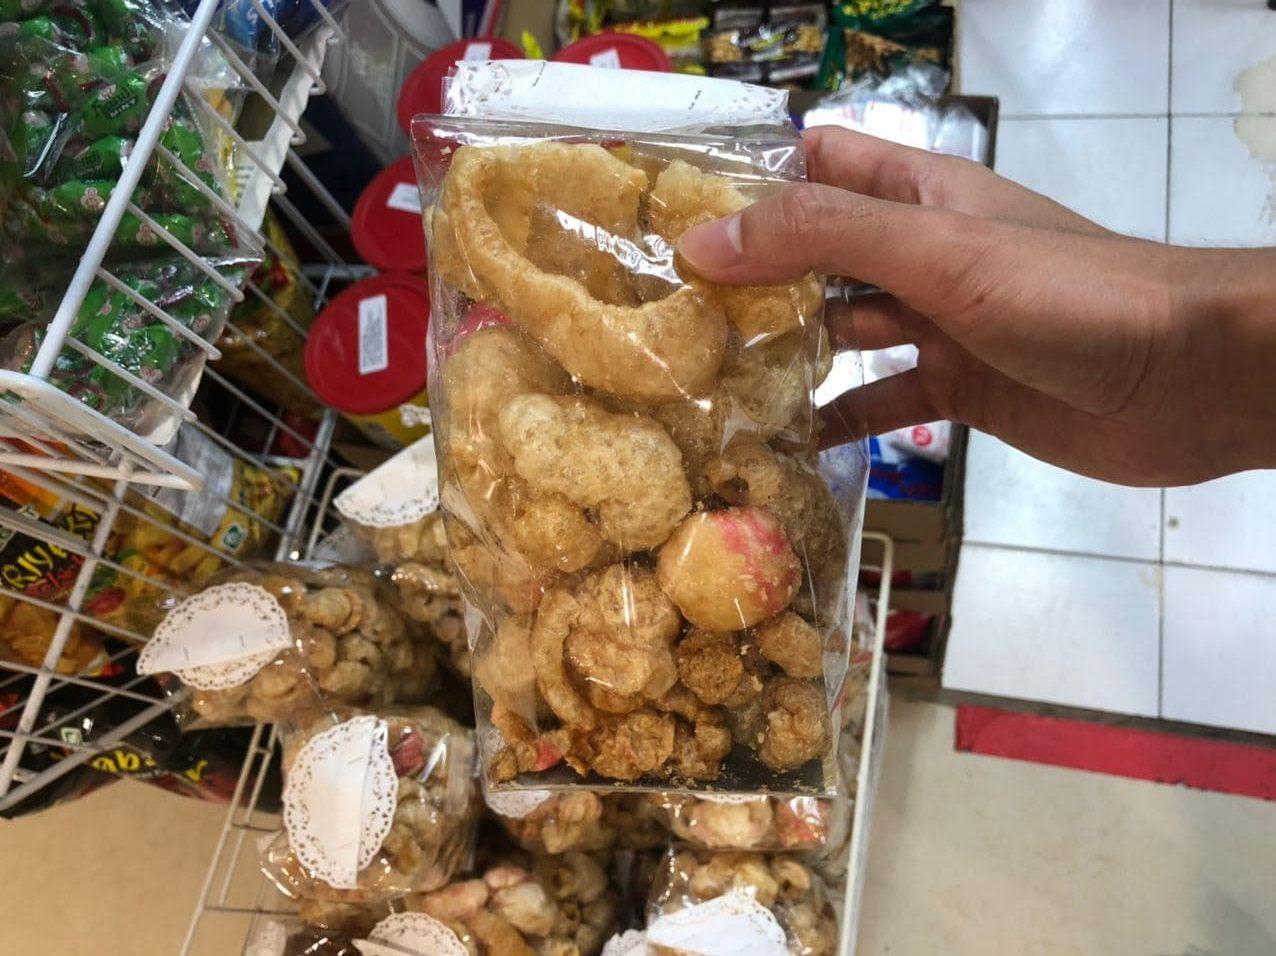 international-snack-shops - fried pork skin